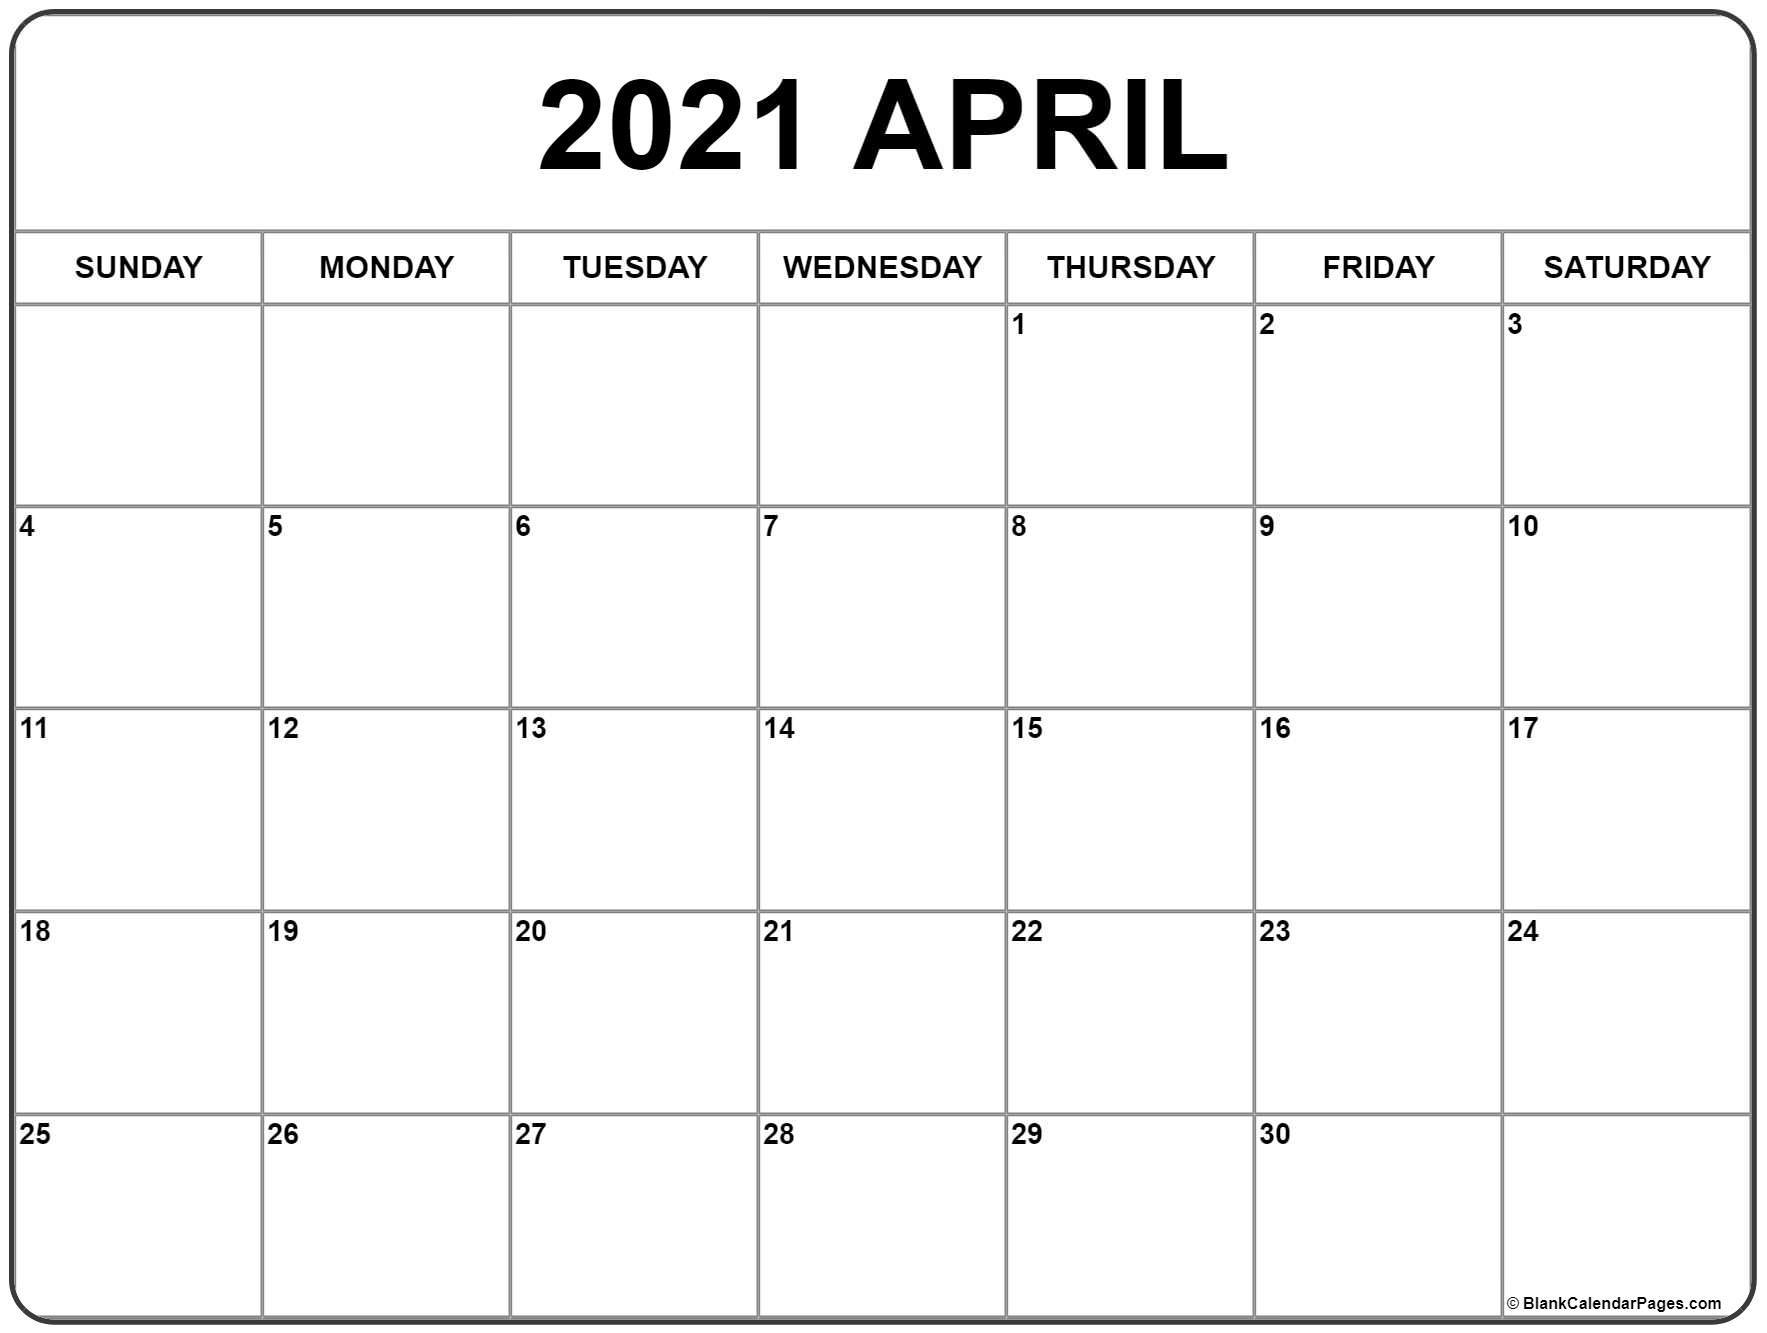 April 2021 Calendar | Free Printable Monthly Calendars  Girly Monthly Calendar Printable 2021